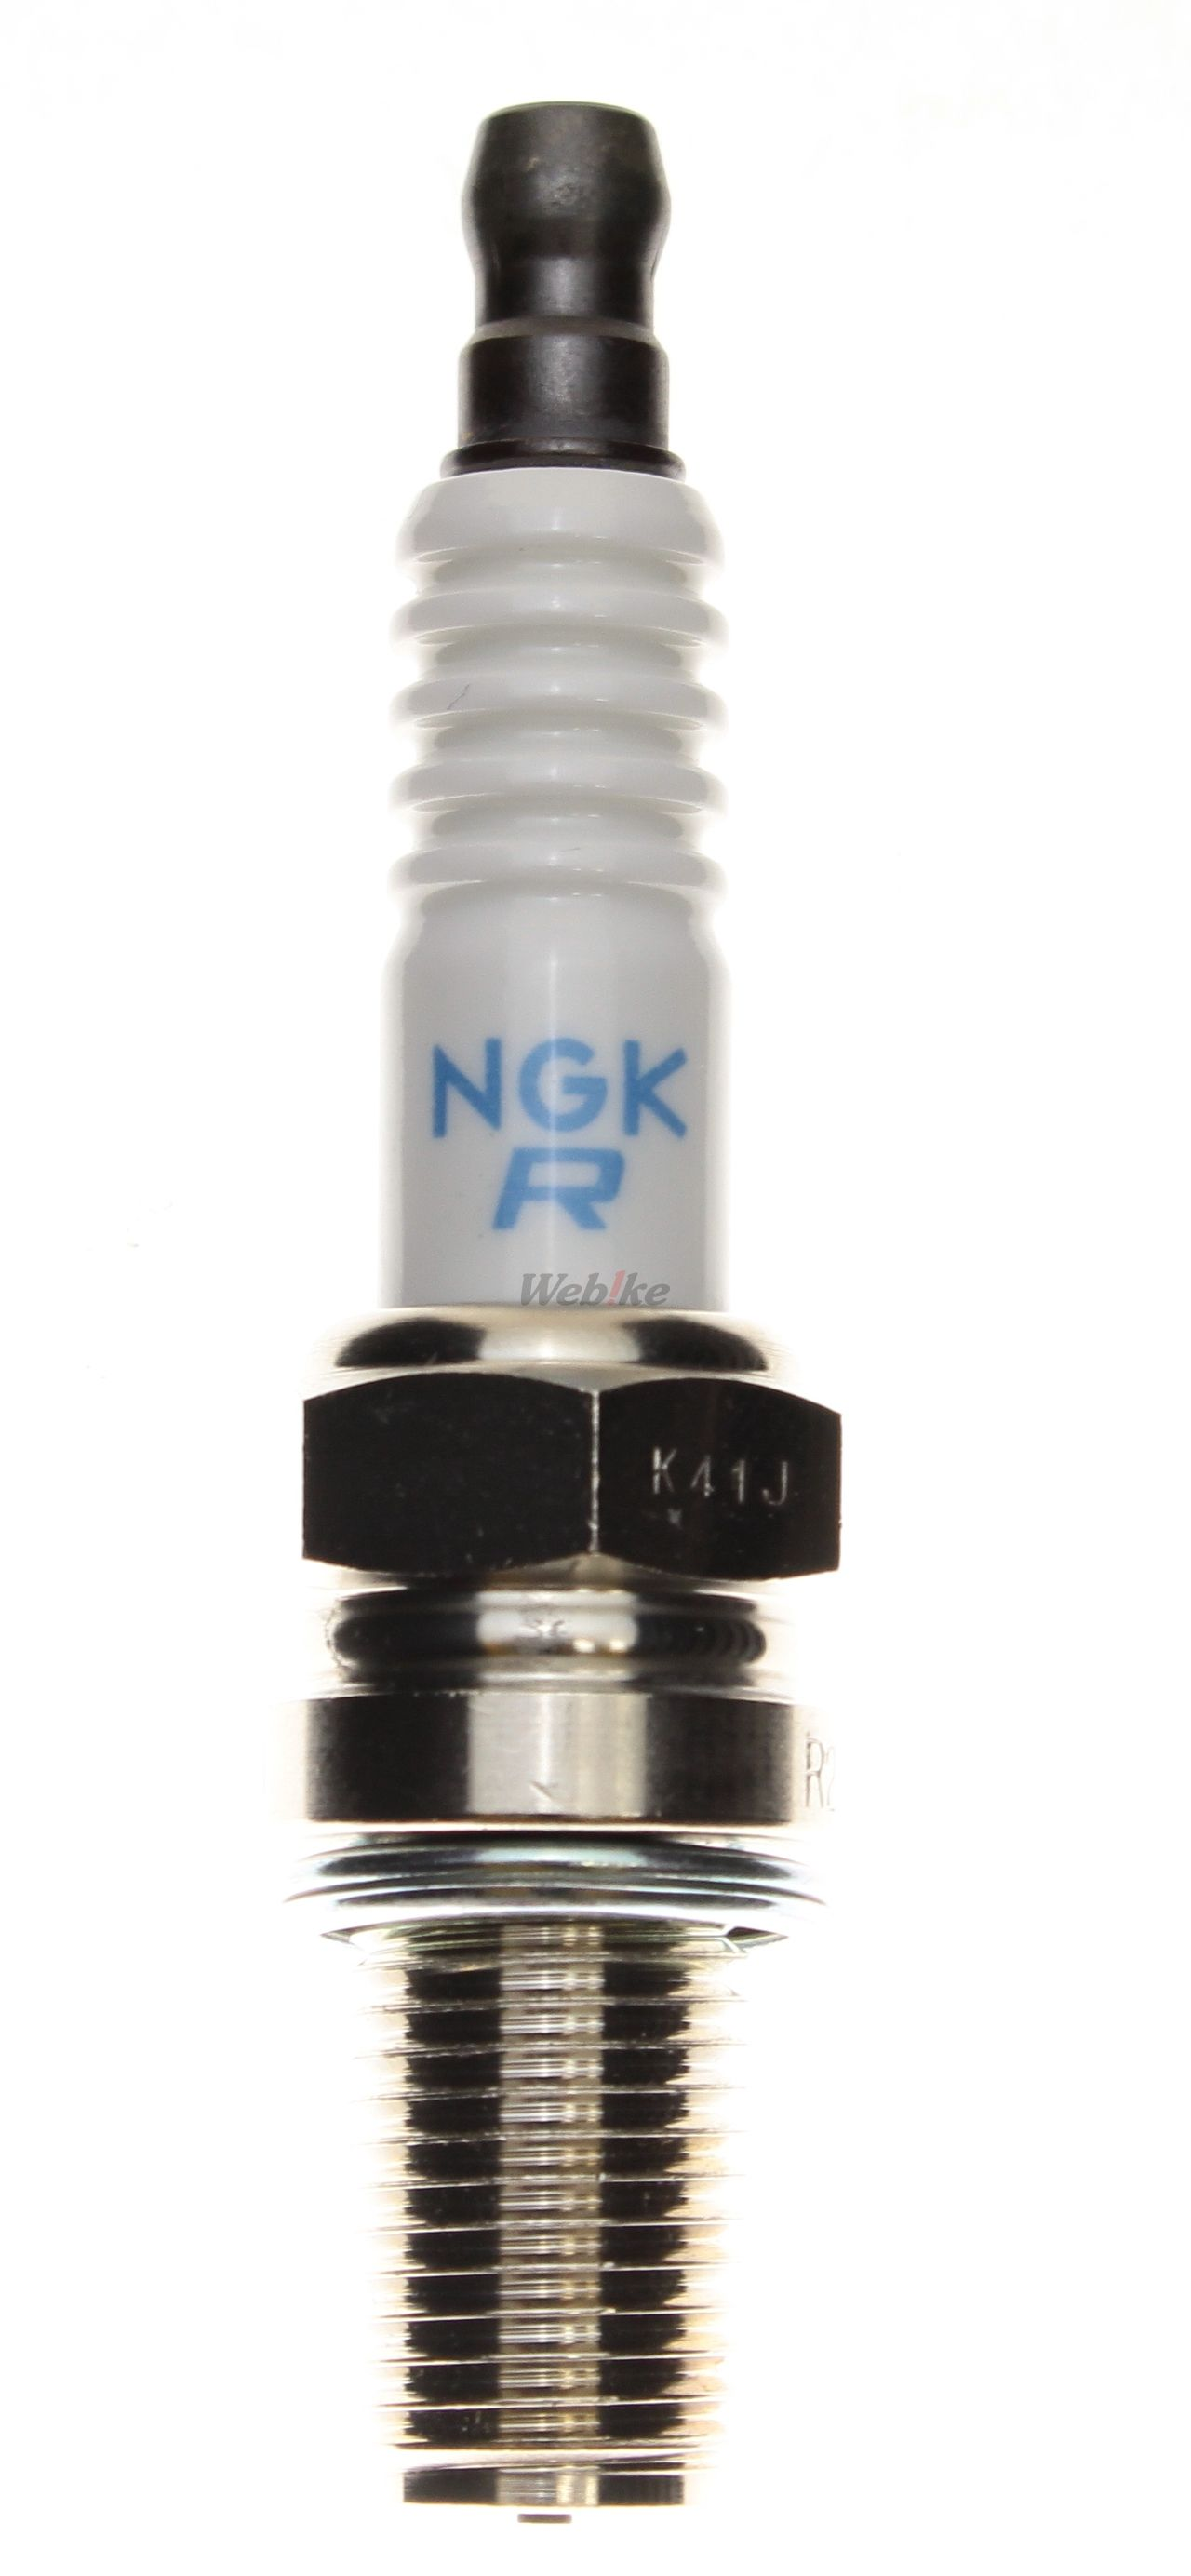 【NGK】競技型 火星塞 R2349-10 6839 - 「Webike-摩托百貨」